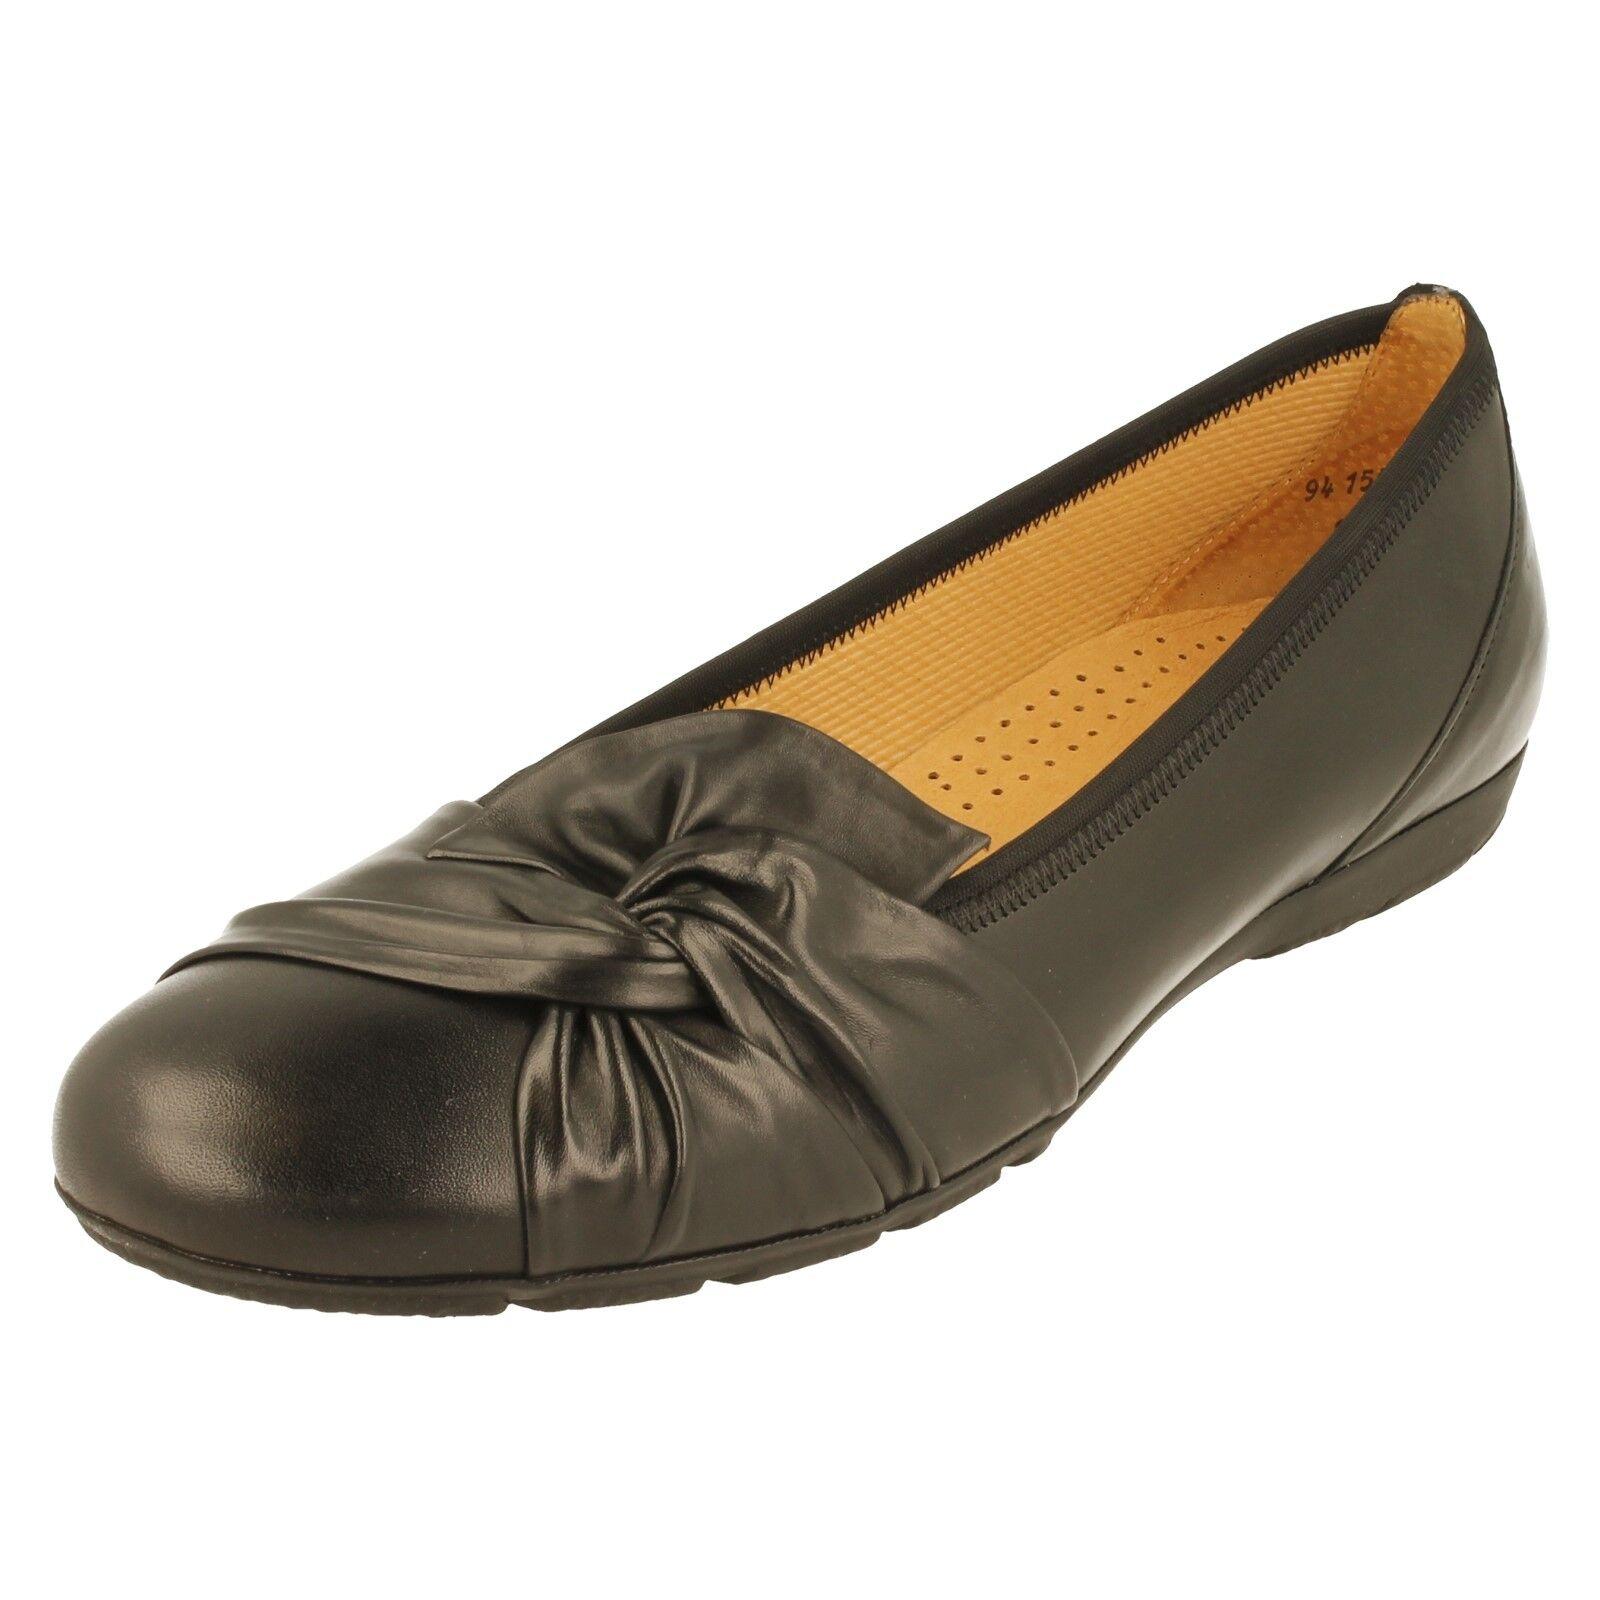 Femmes Gabor Chaussures Style - 94150